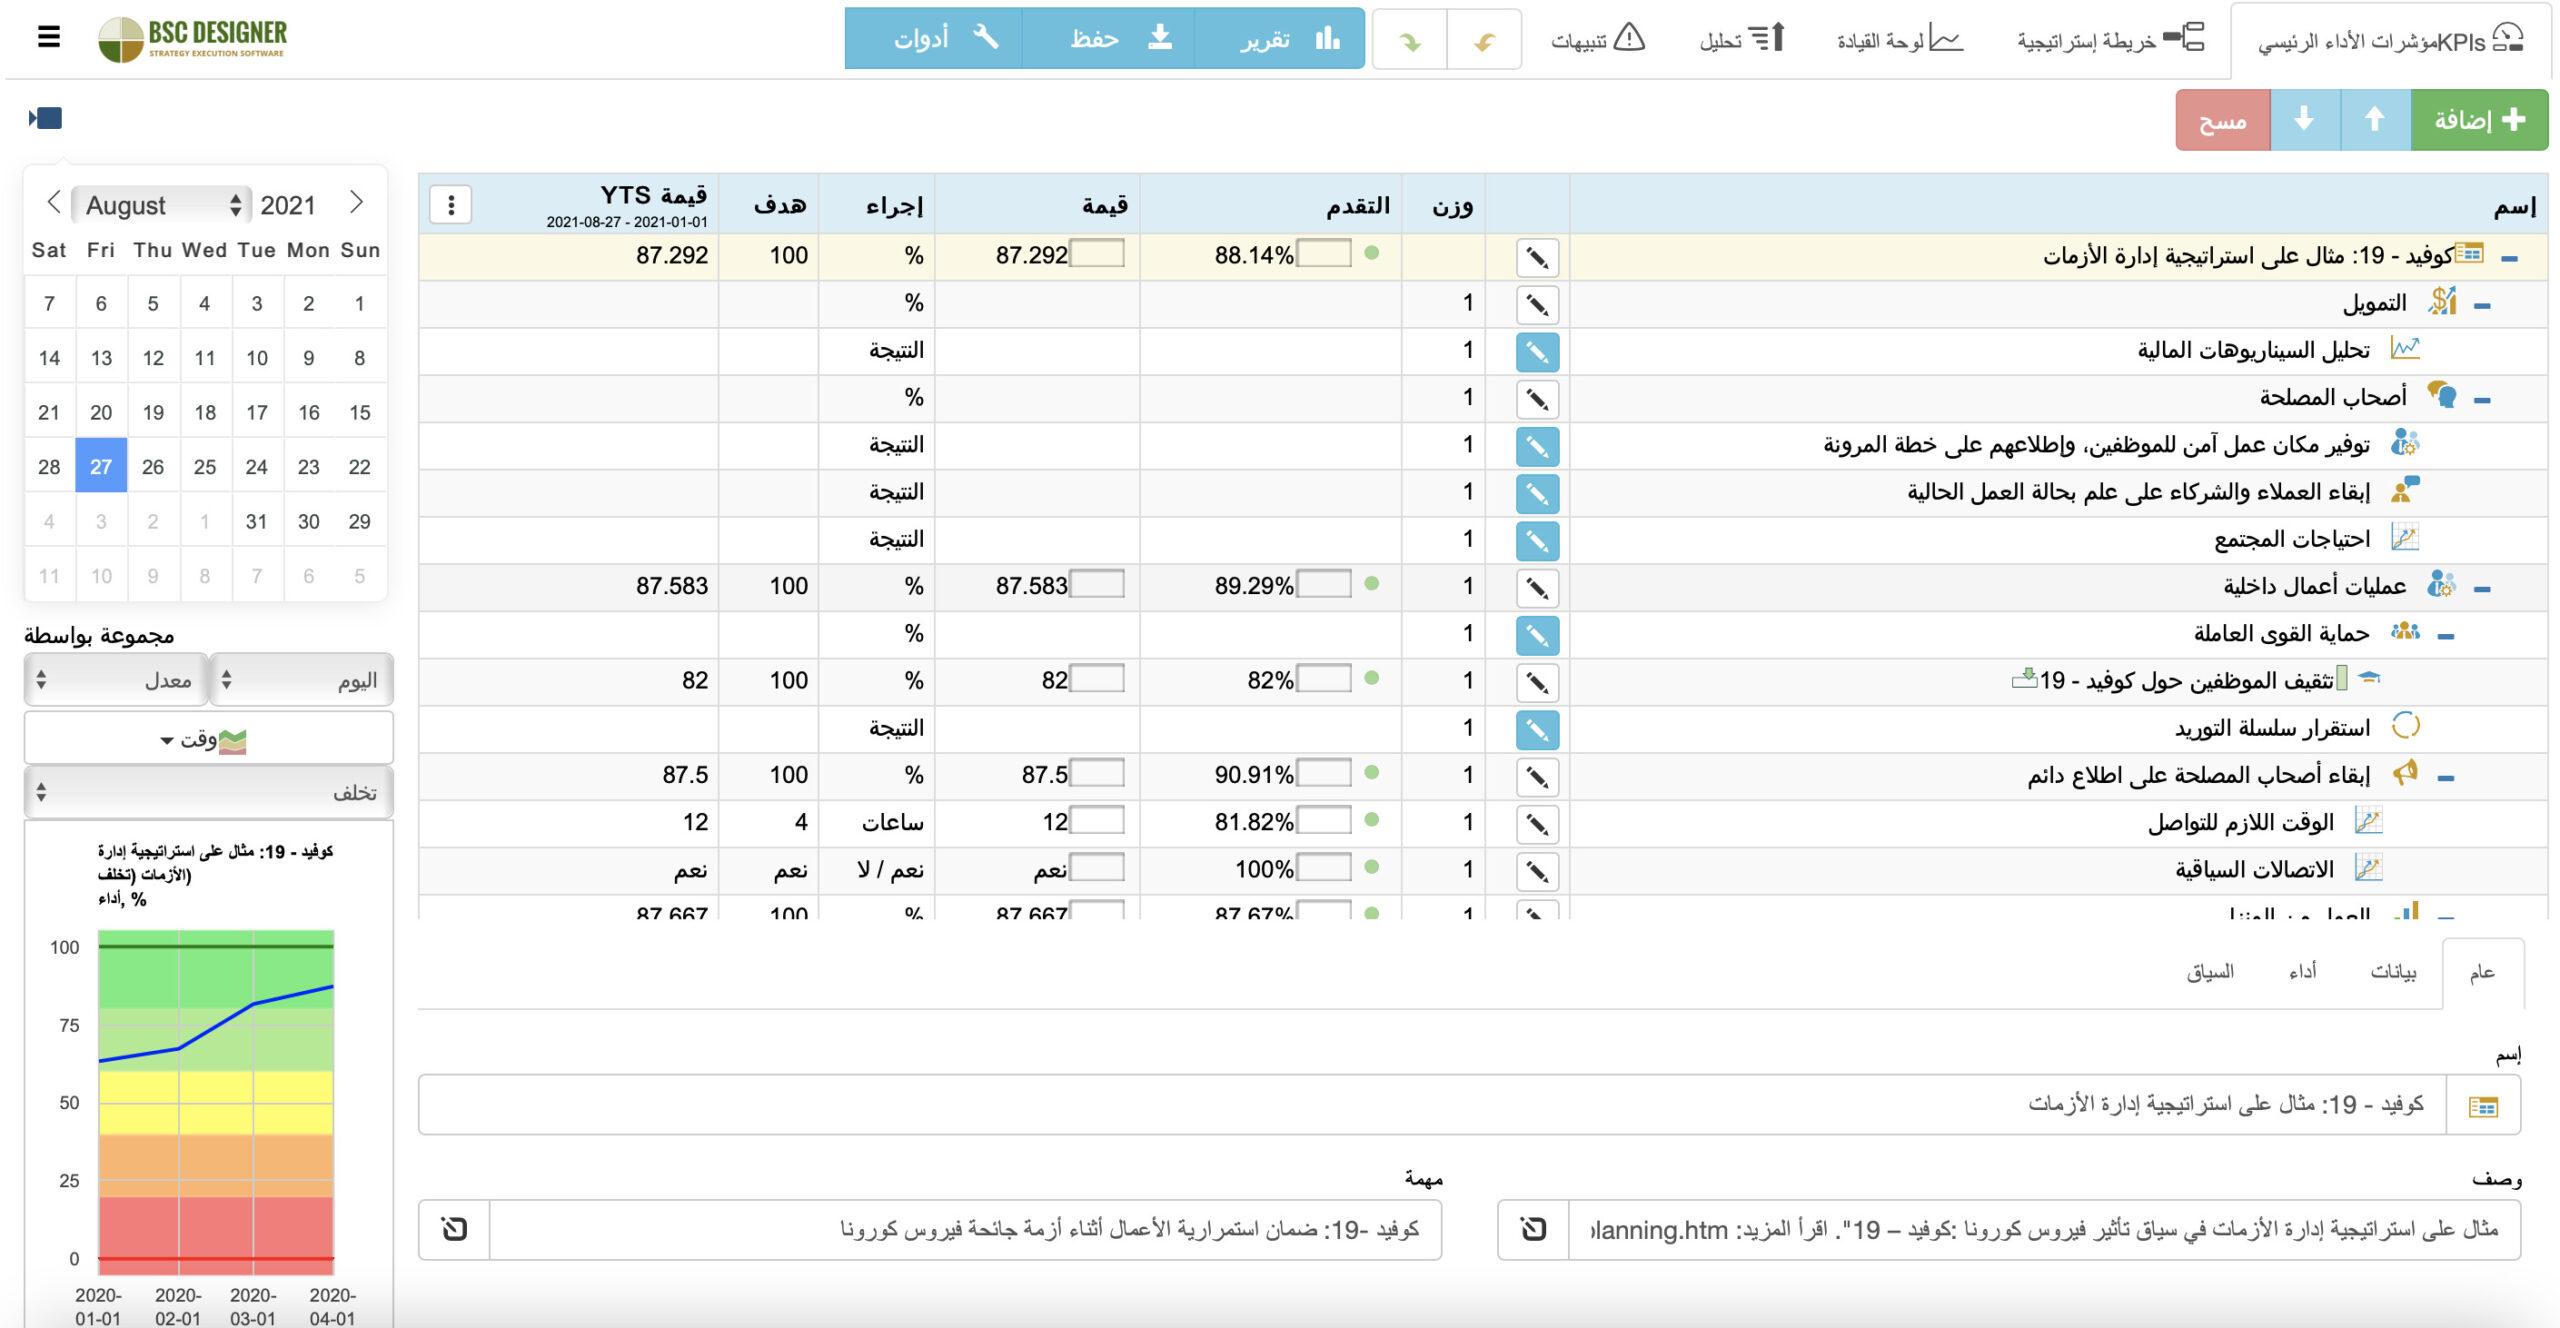 Arabic version of BSC Designer